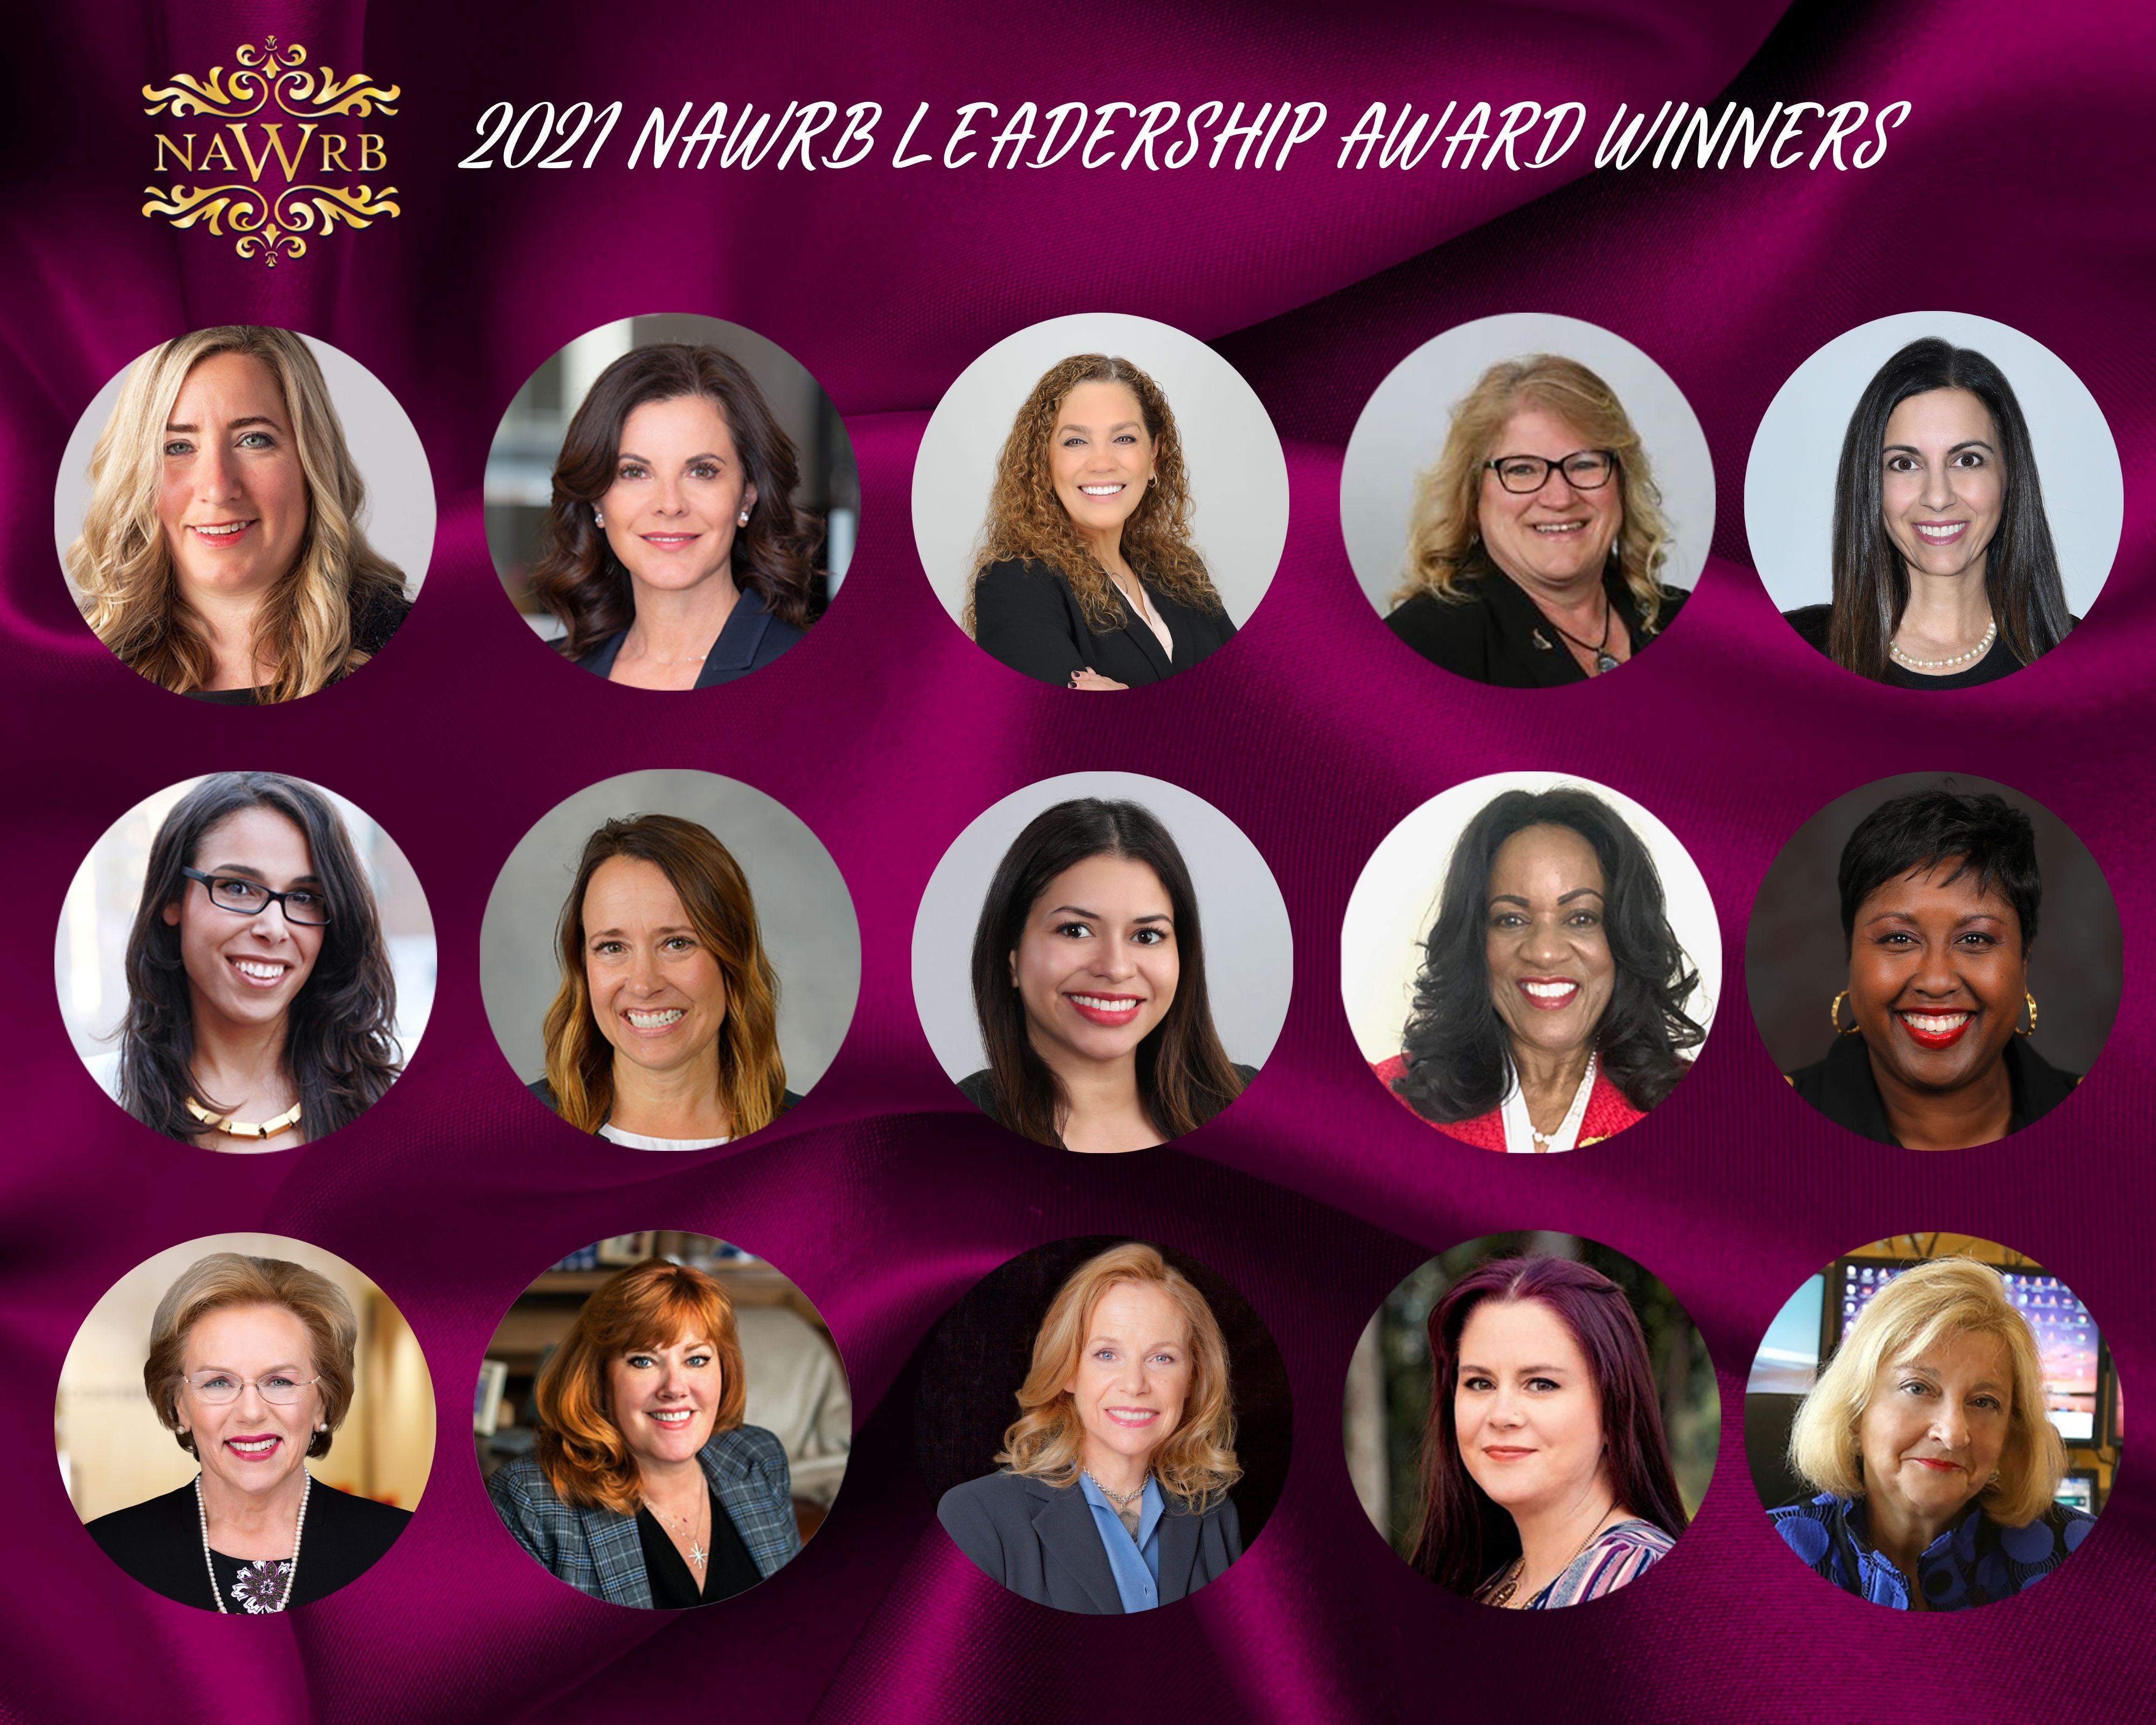 Presenting the 2021 NAWRB Leadership Award Winners